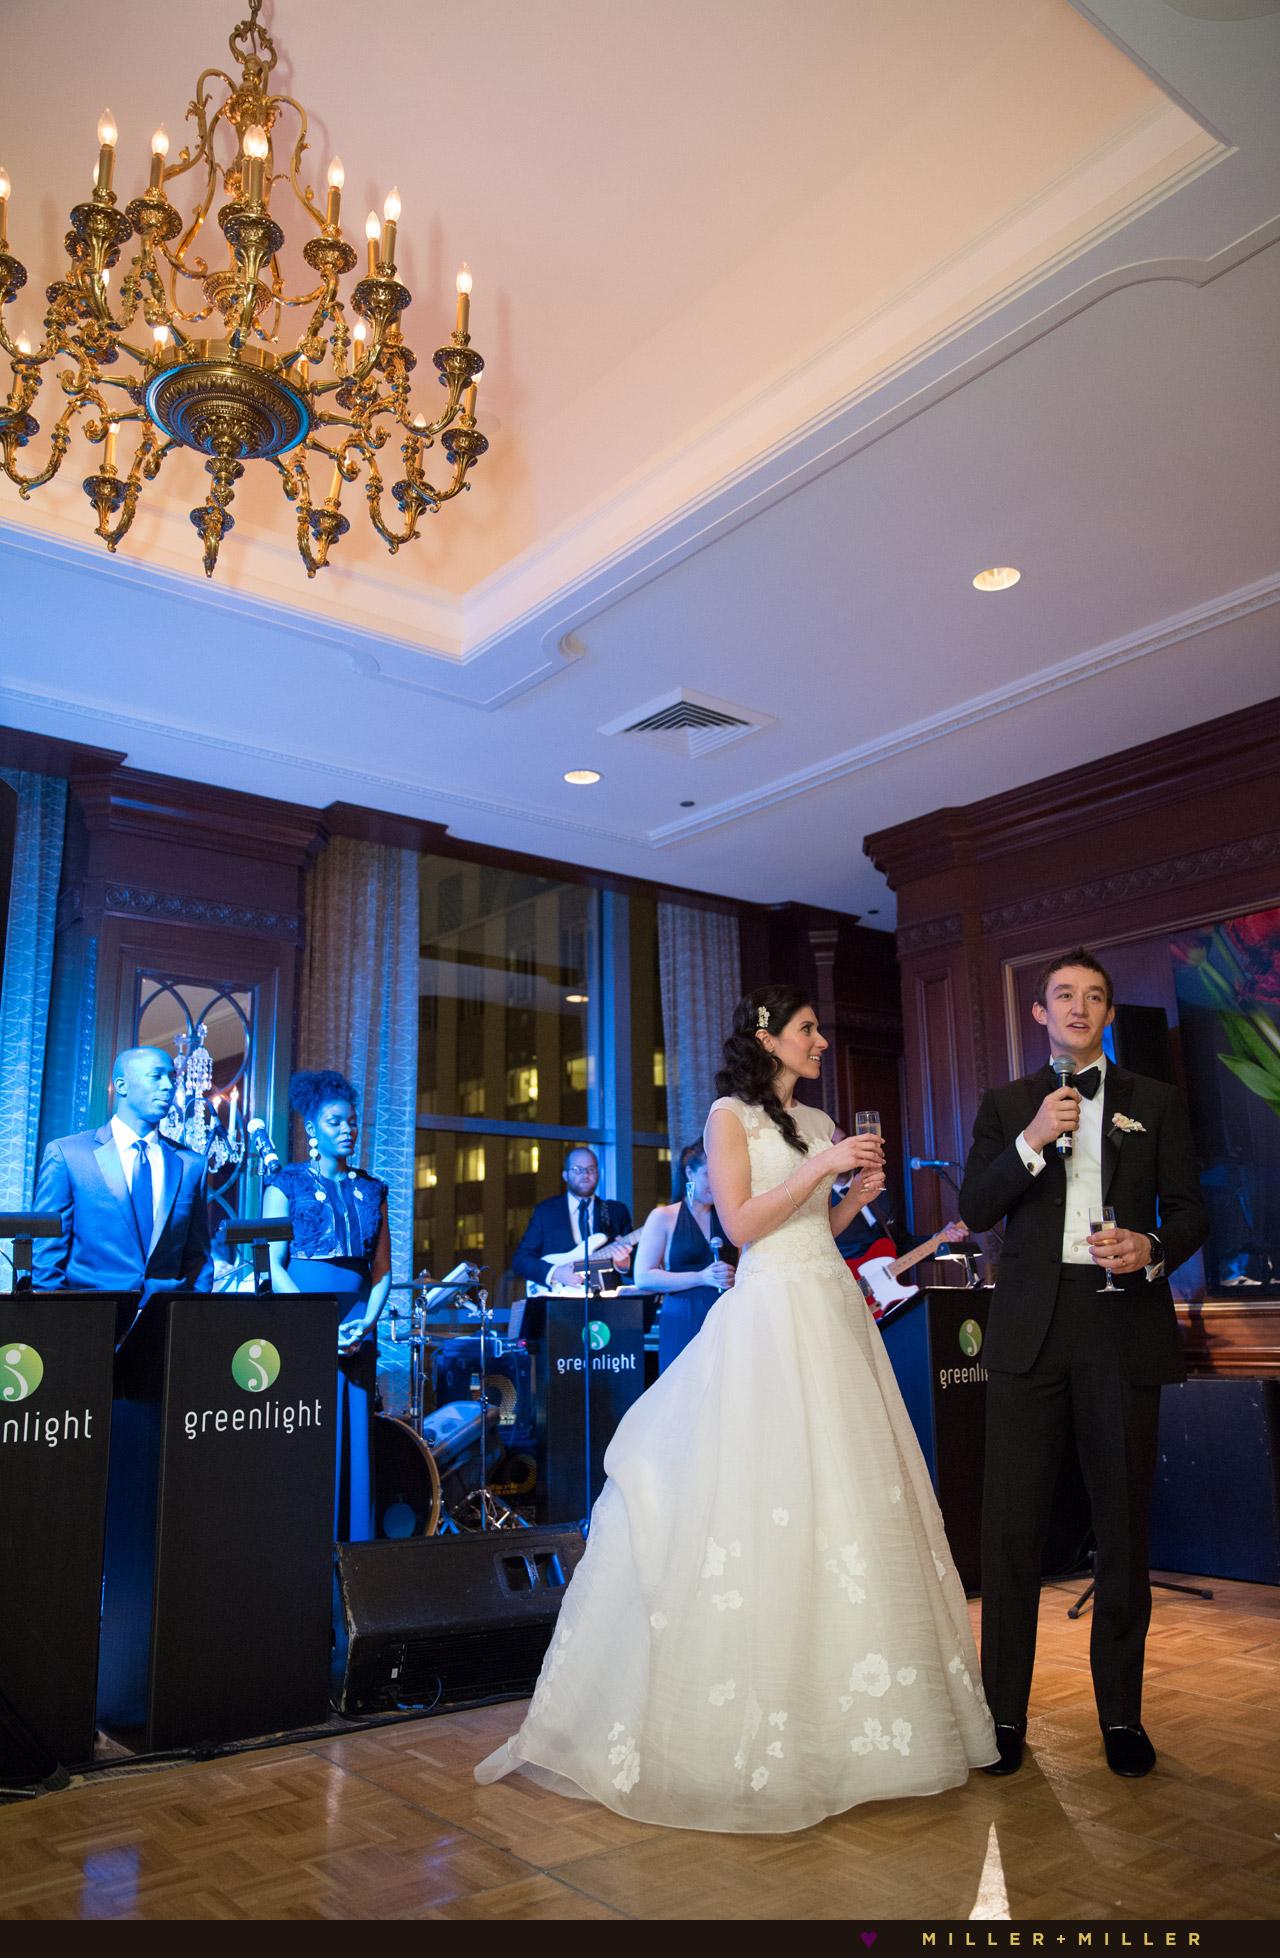 four-seasons-chicago-ballroom-wedding